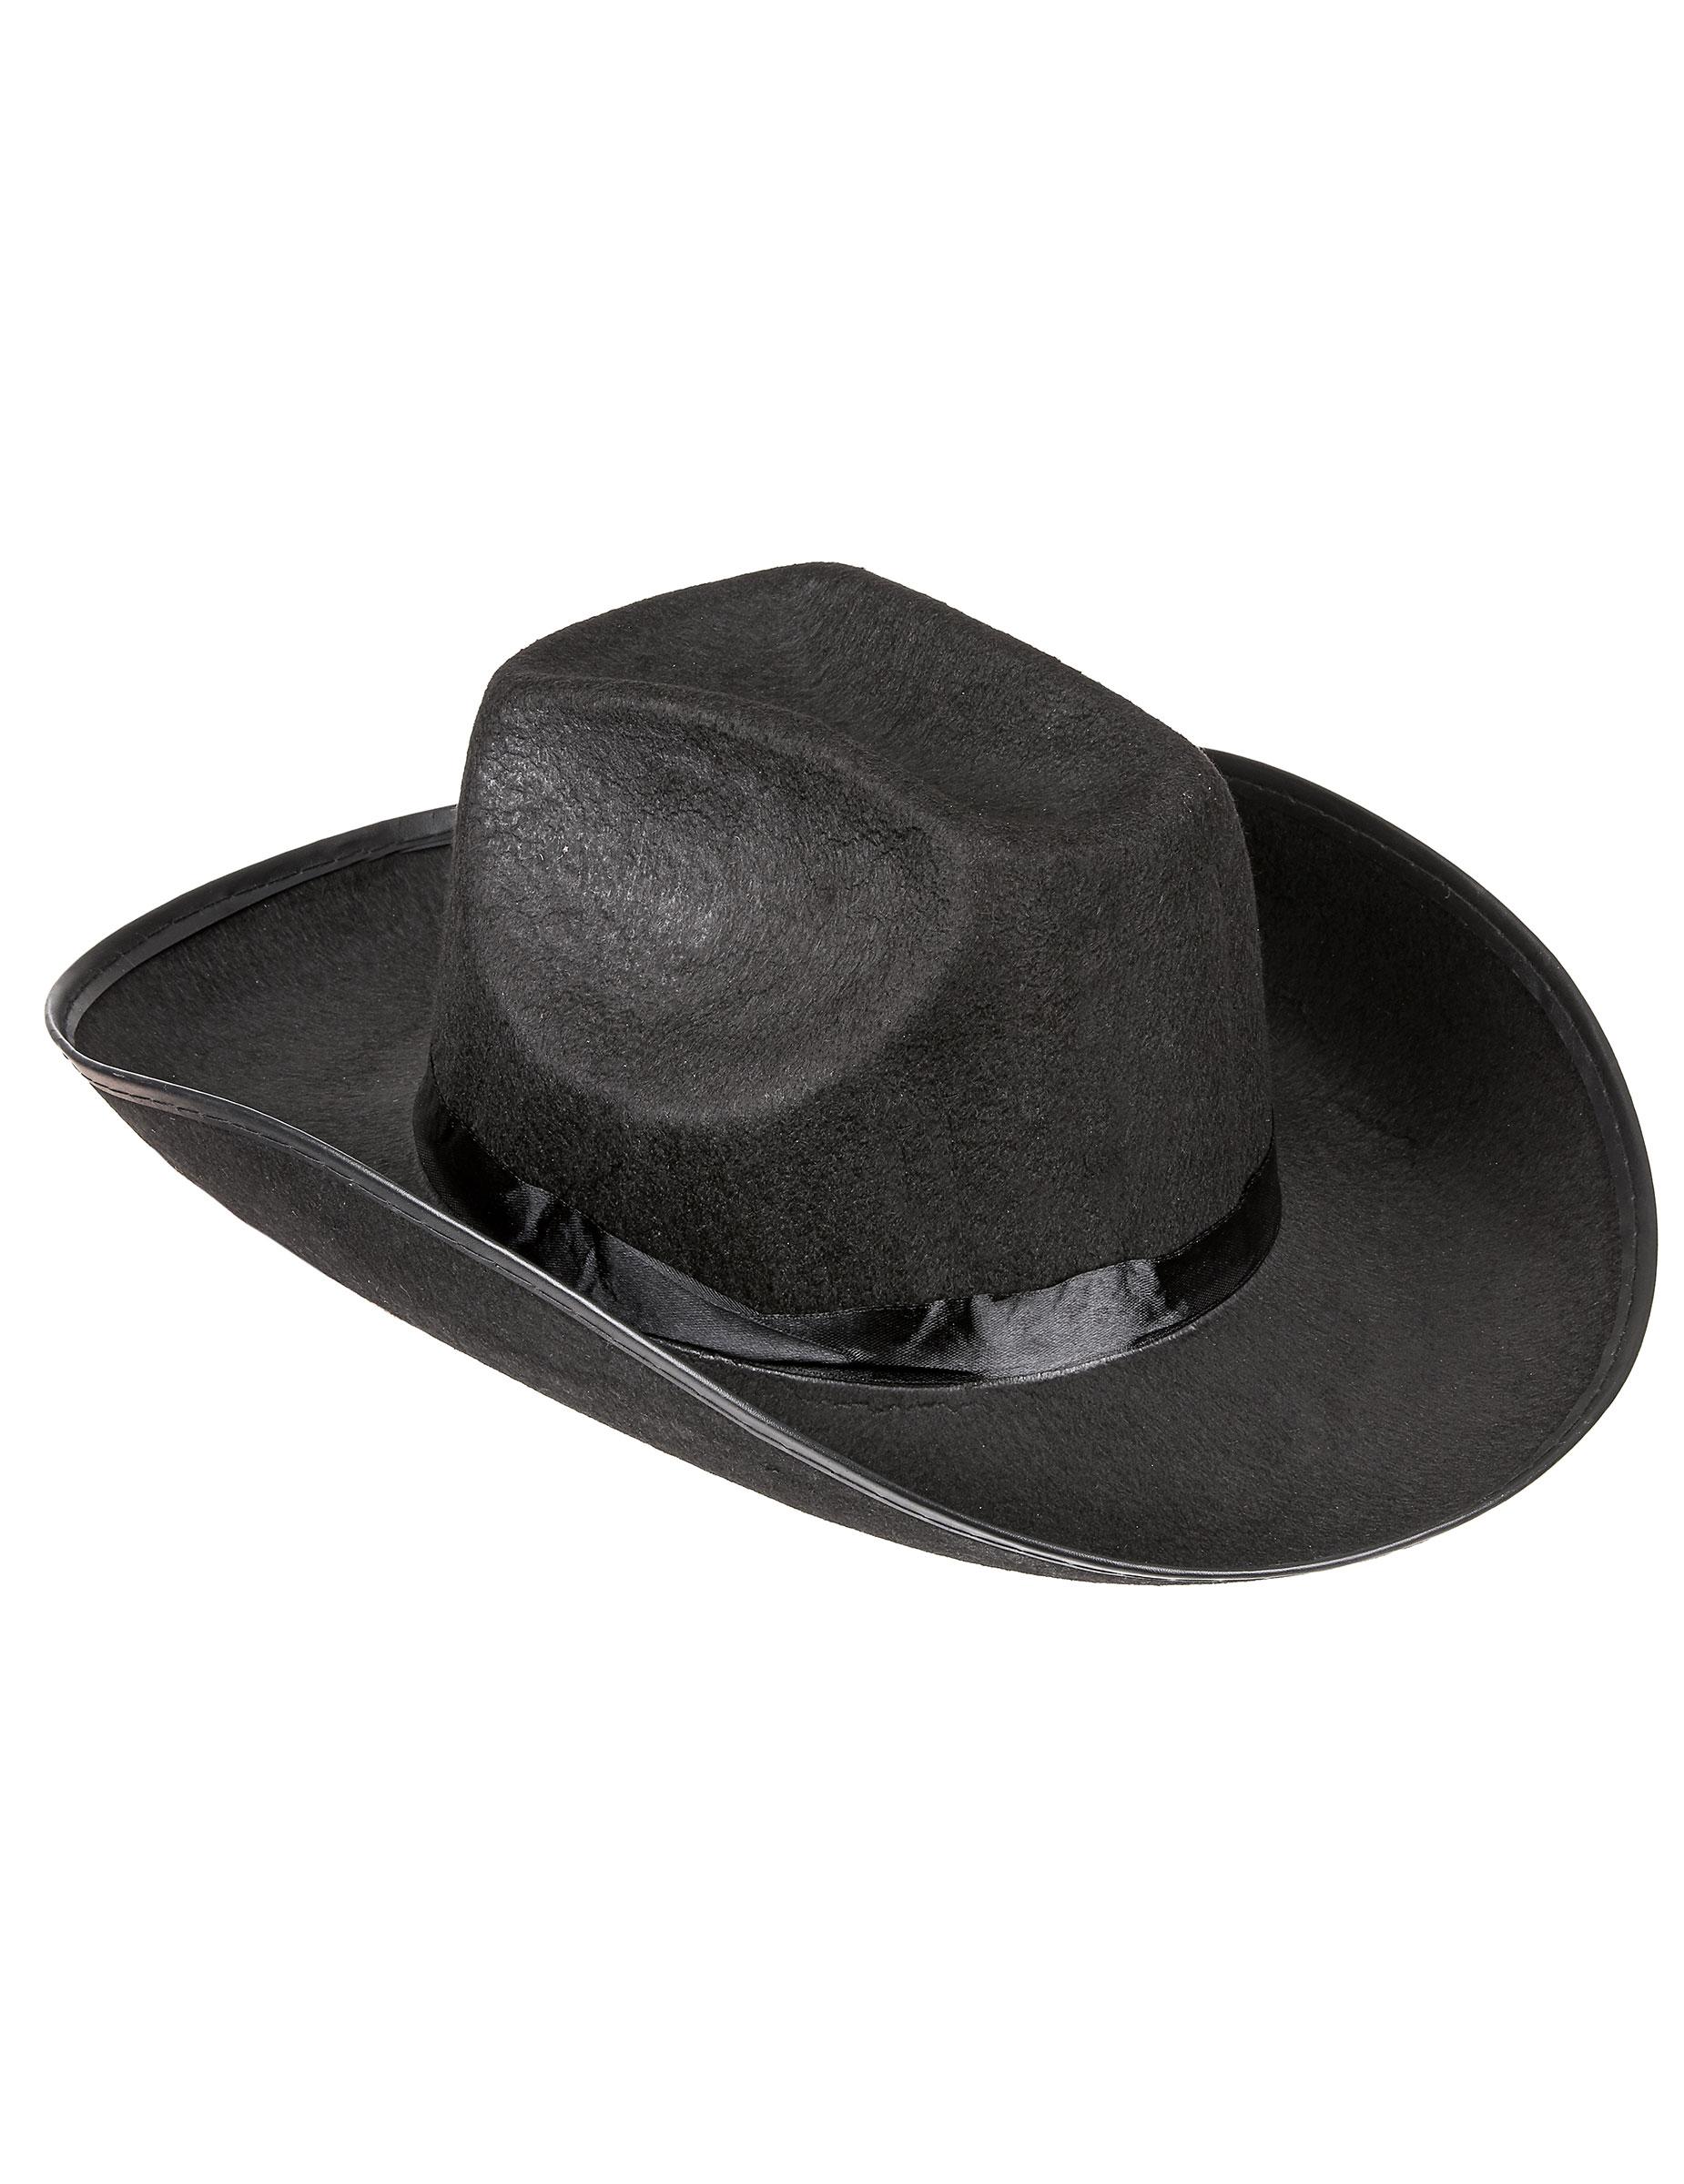 Cappello da cowboy per adulto su VegaooParty f50b46a84b94